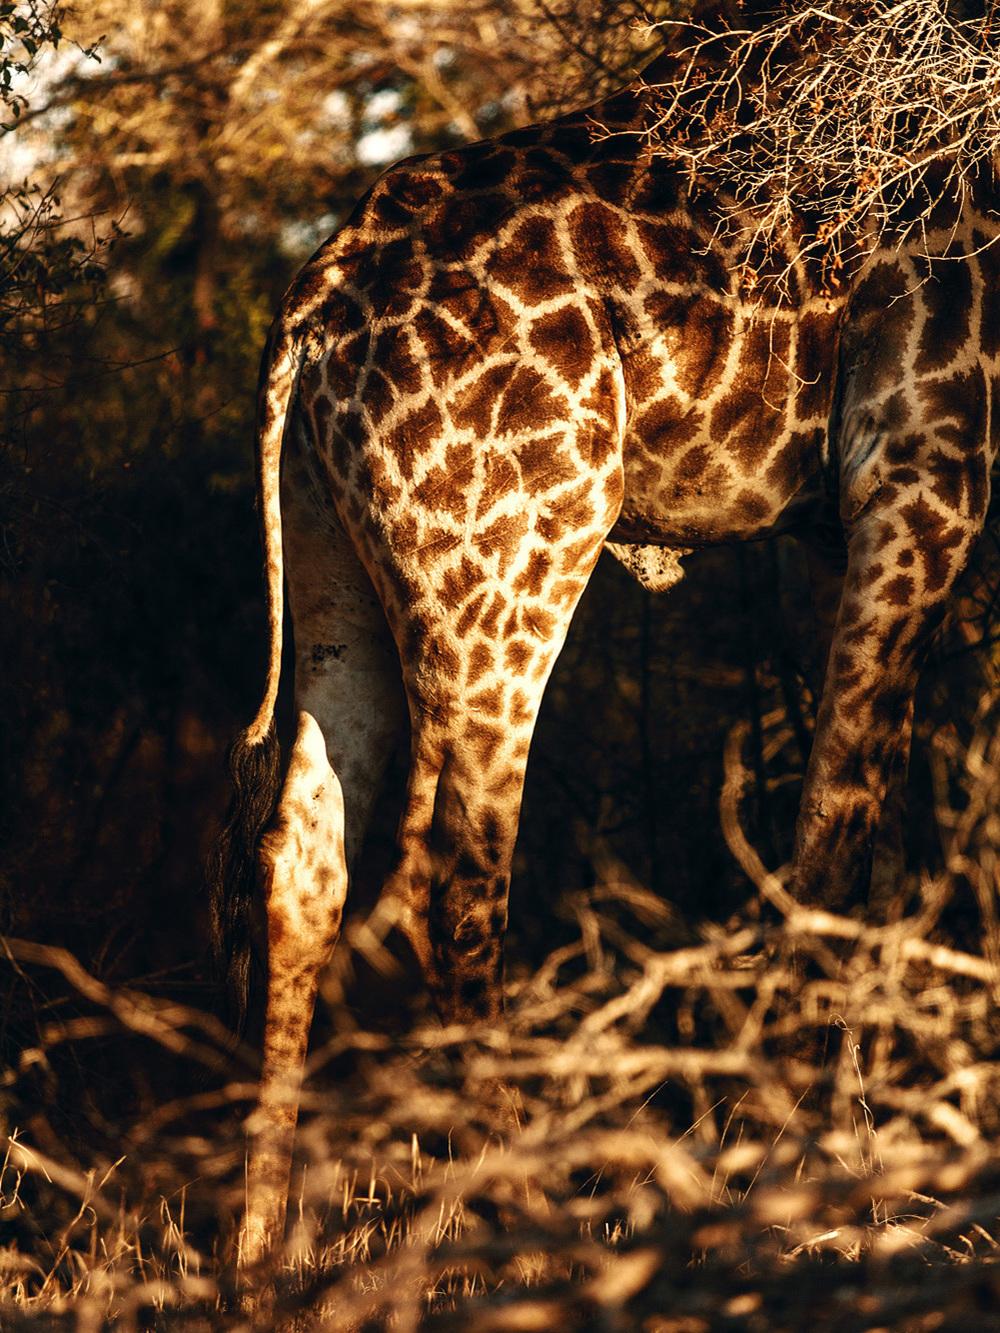 CallieGiovanna_Africa_SouthAfrica_KrugerNationalPark_20150701_3664.jpg